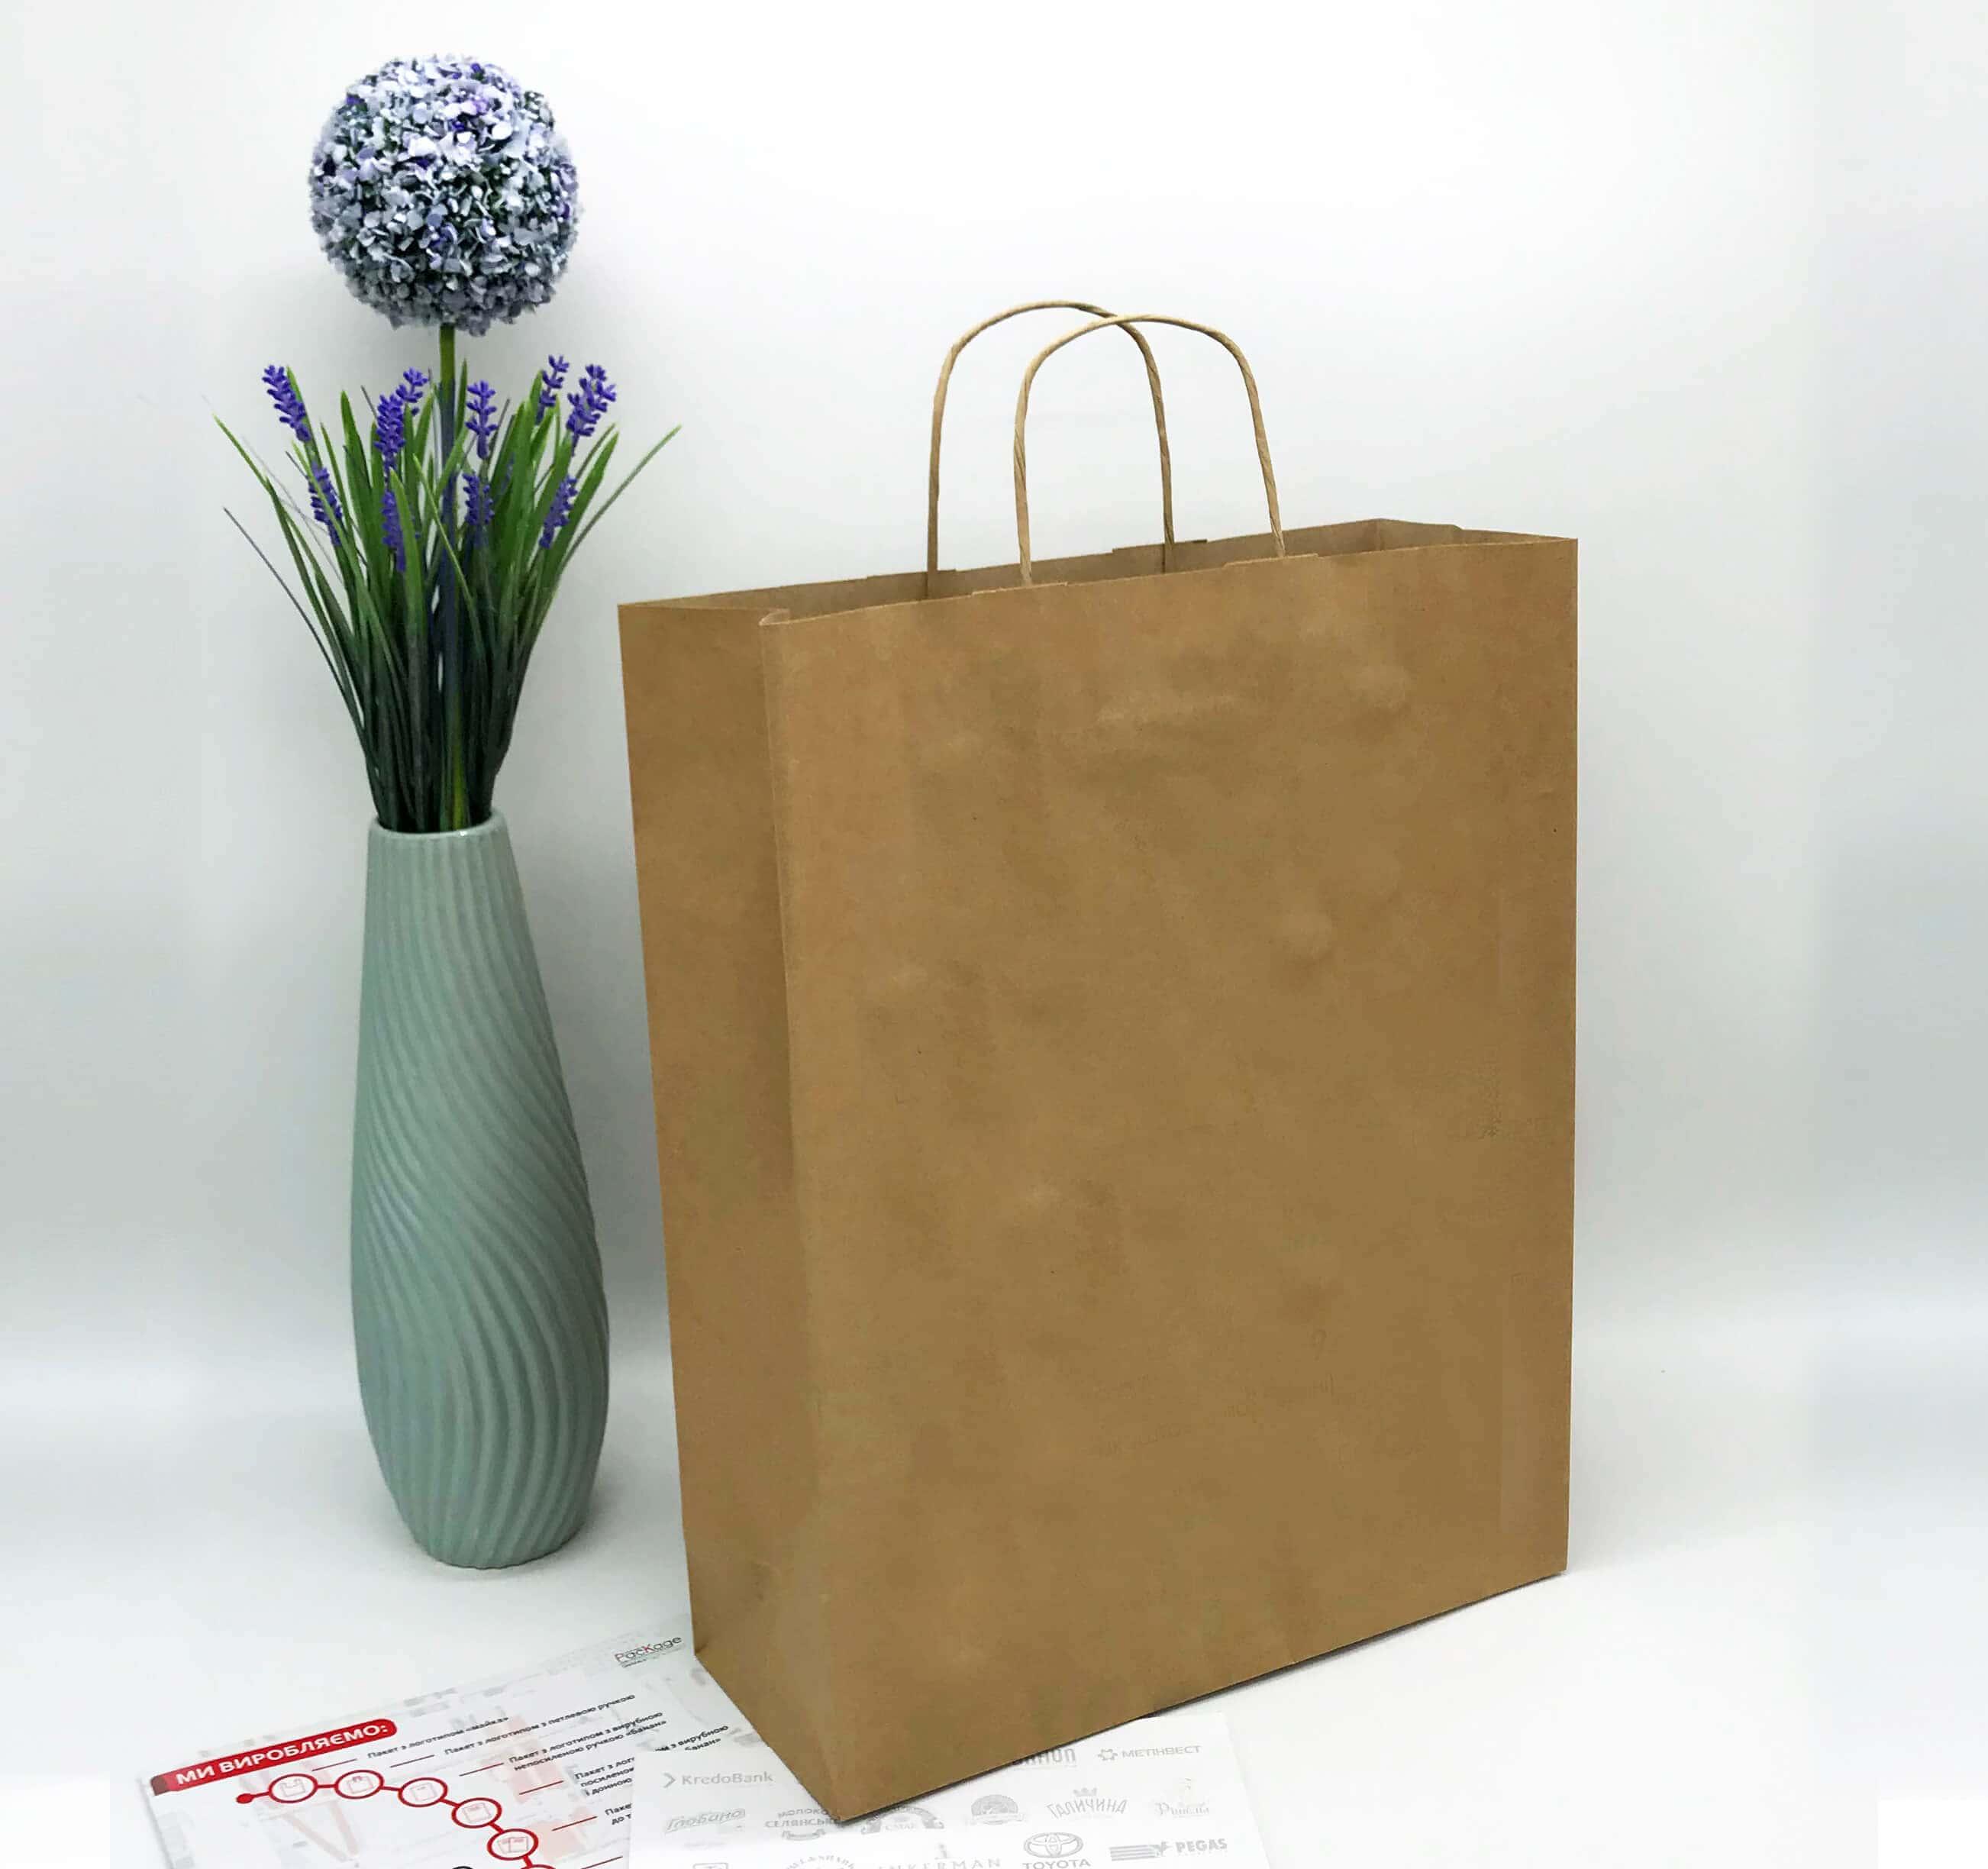 Бурый крафт пакет без печати 320*400, 90 г/см -Chernigov Package - Фото Бурый сред_бп